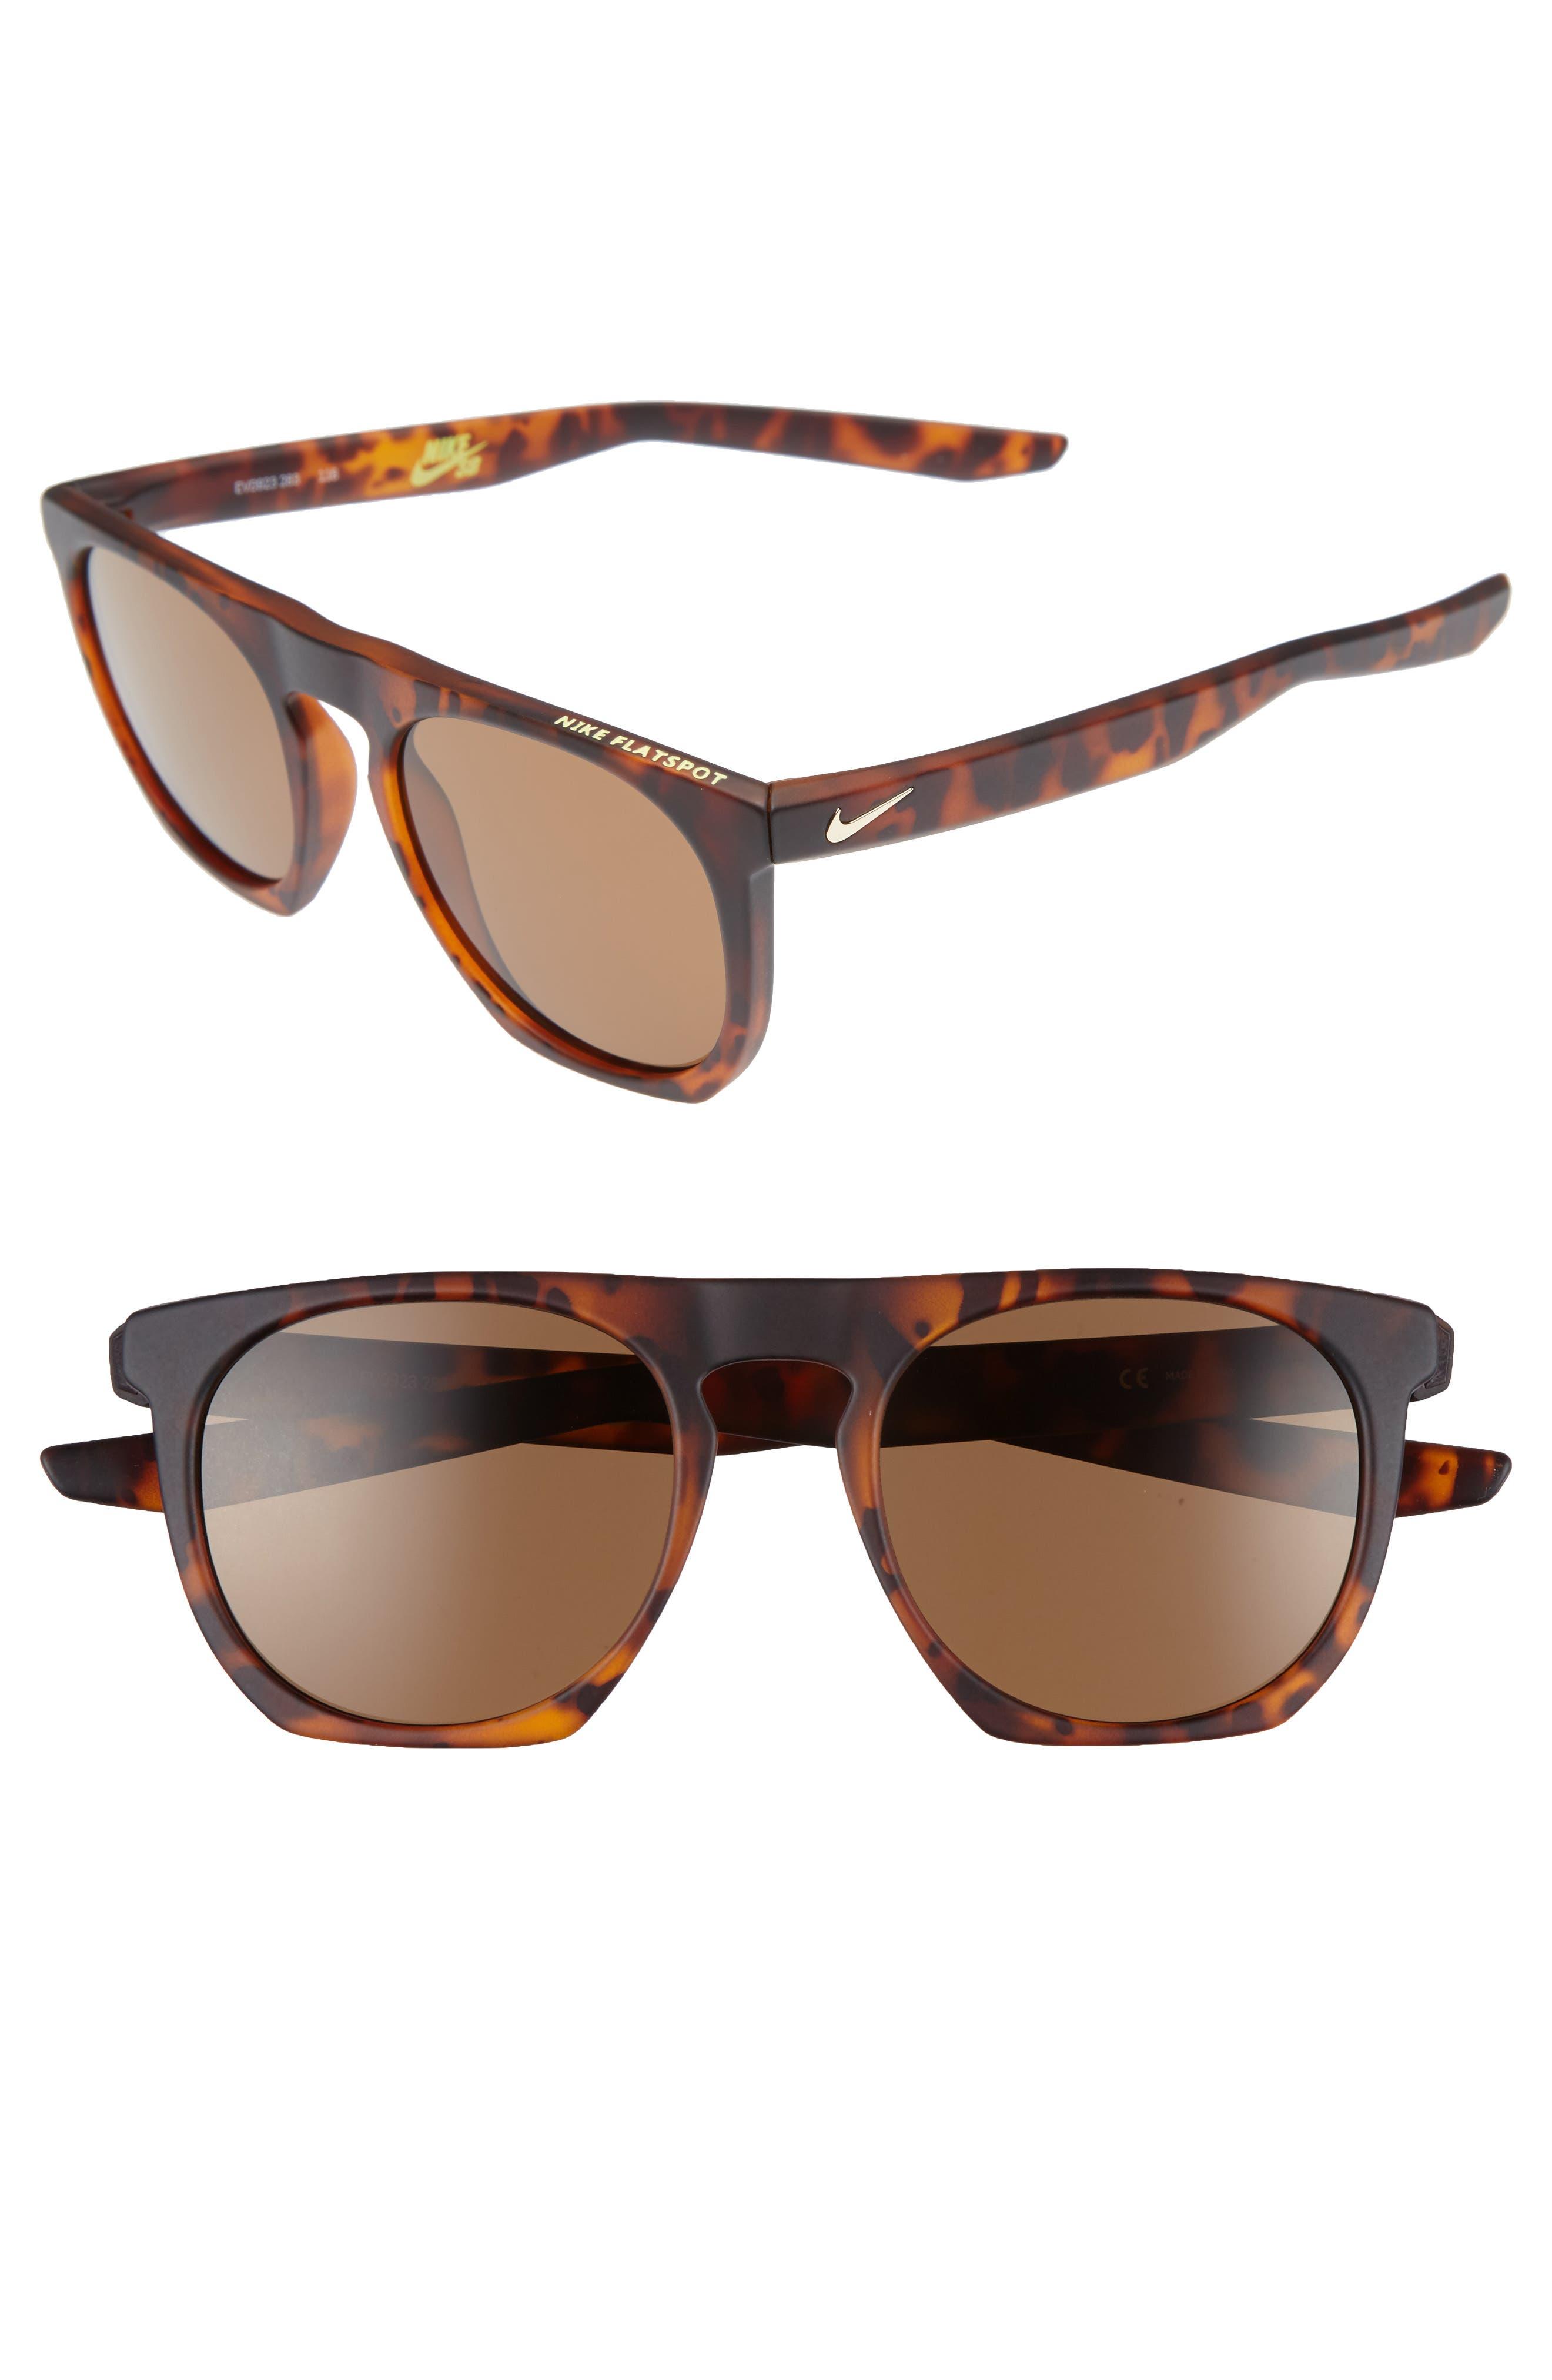 nike sunglasses womens orange